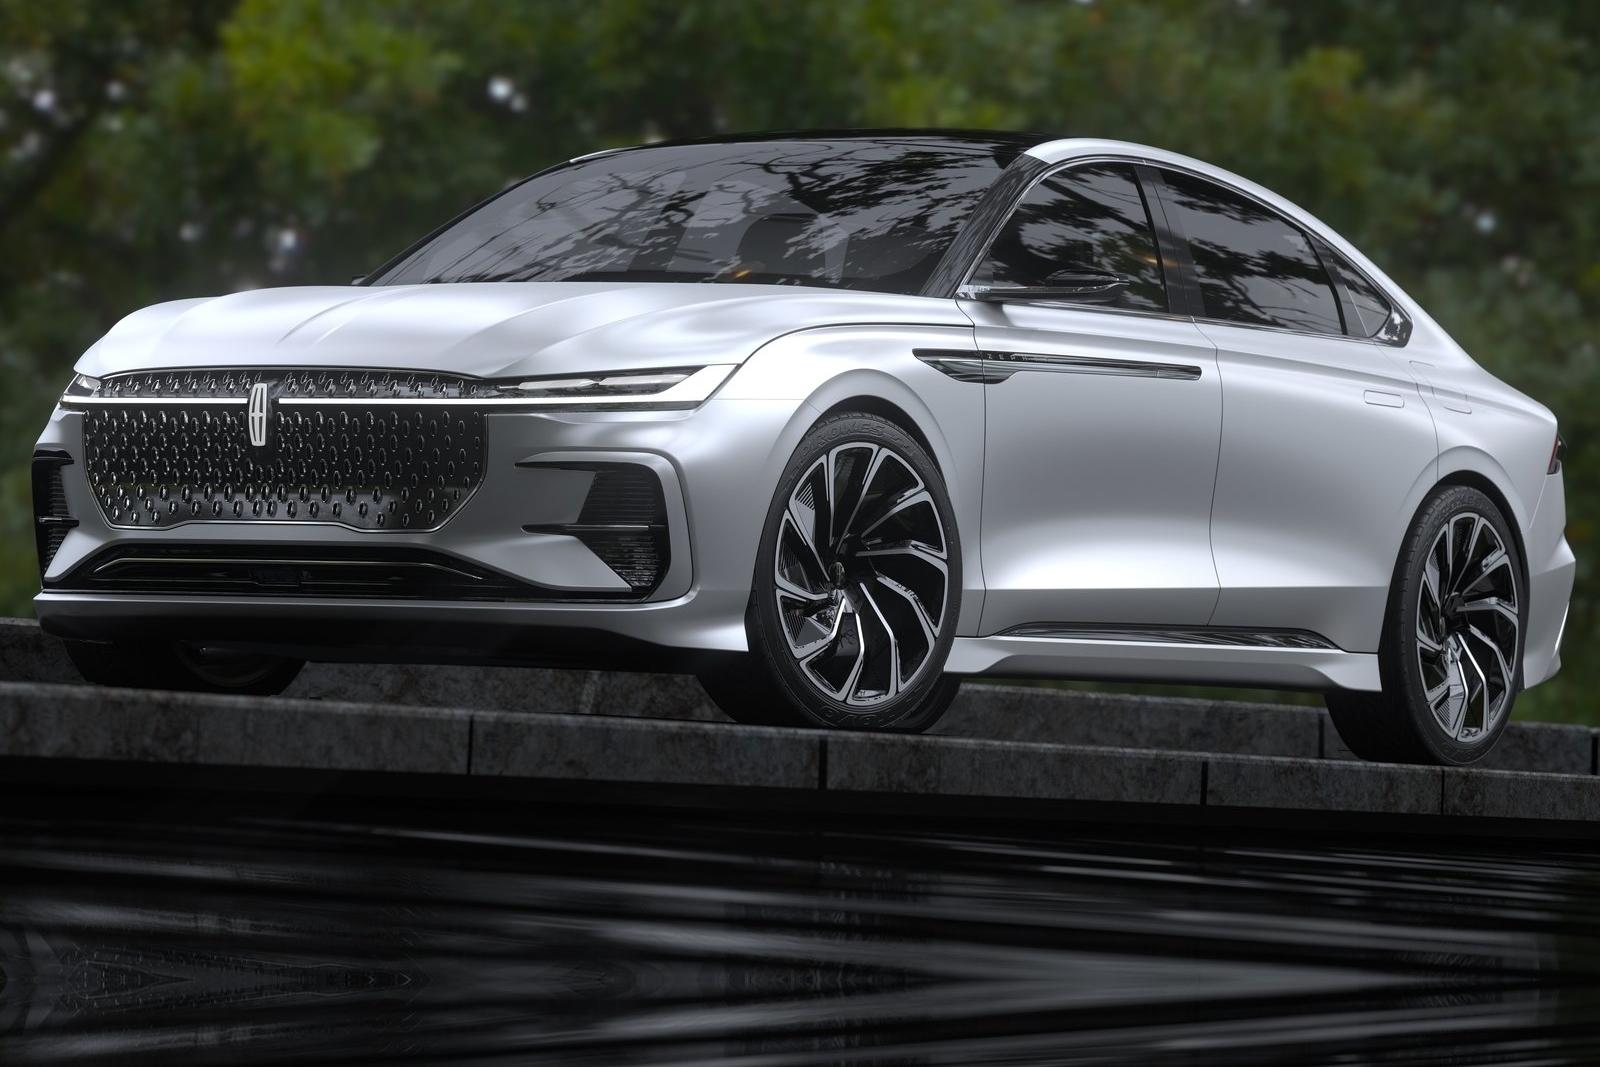 Lincoln-Zephyr_Reflection_Concept-2021-1600-01